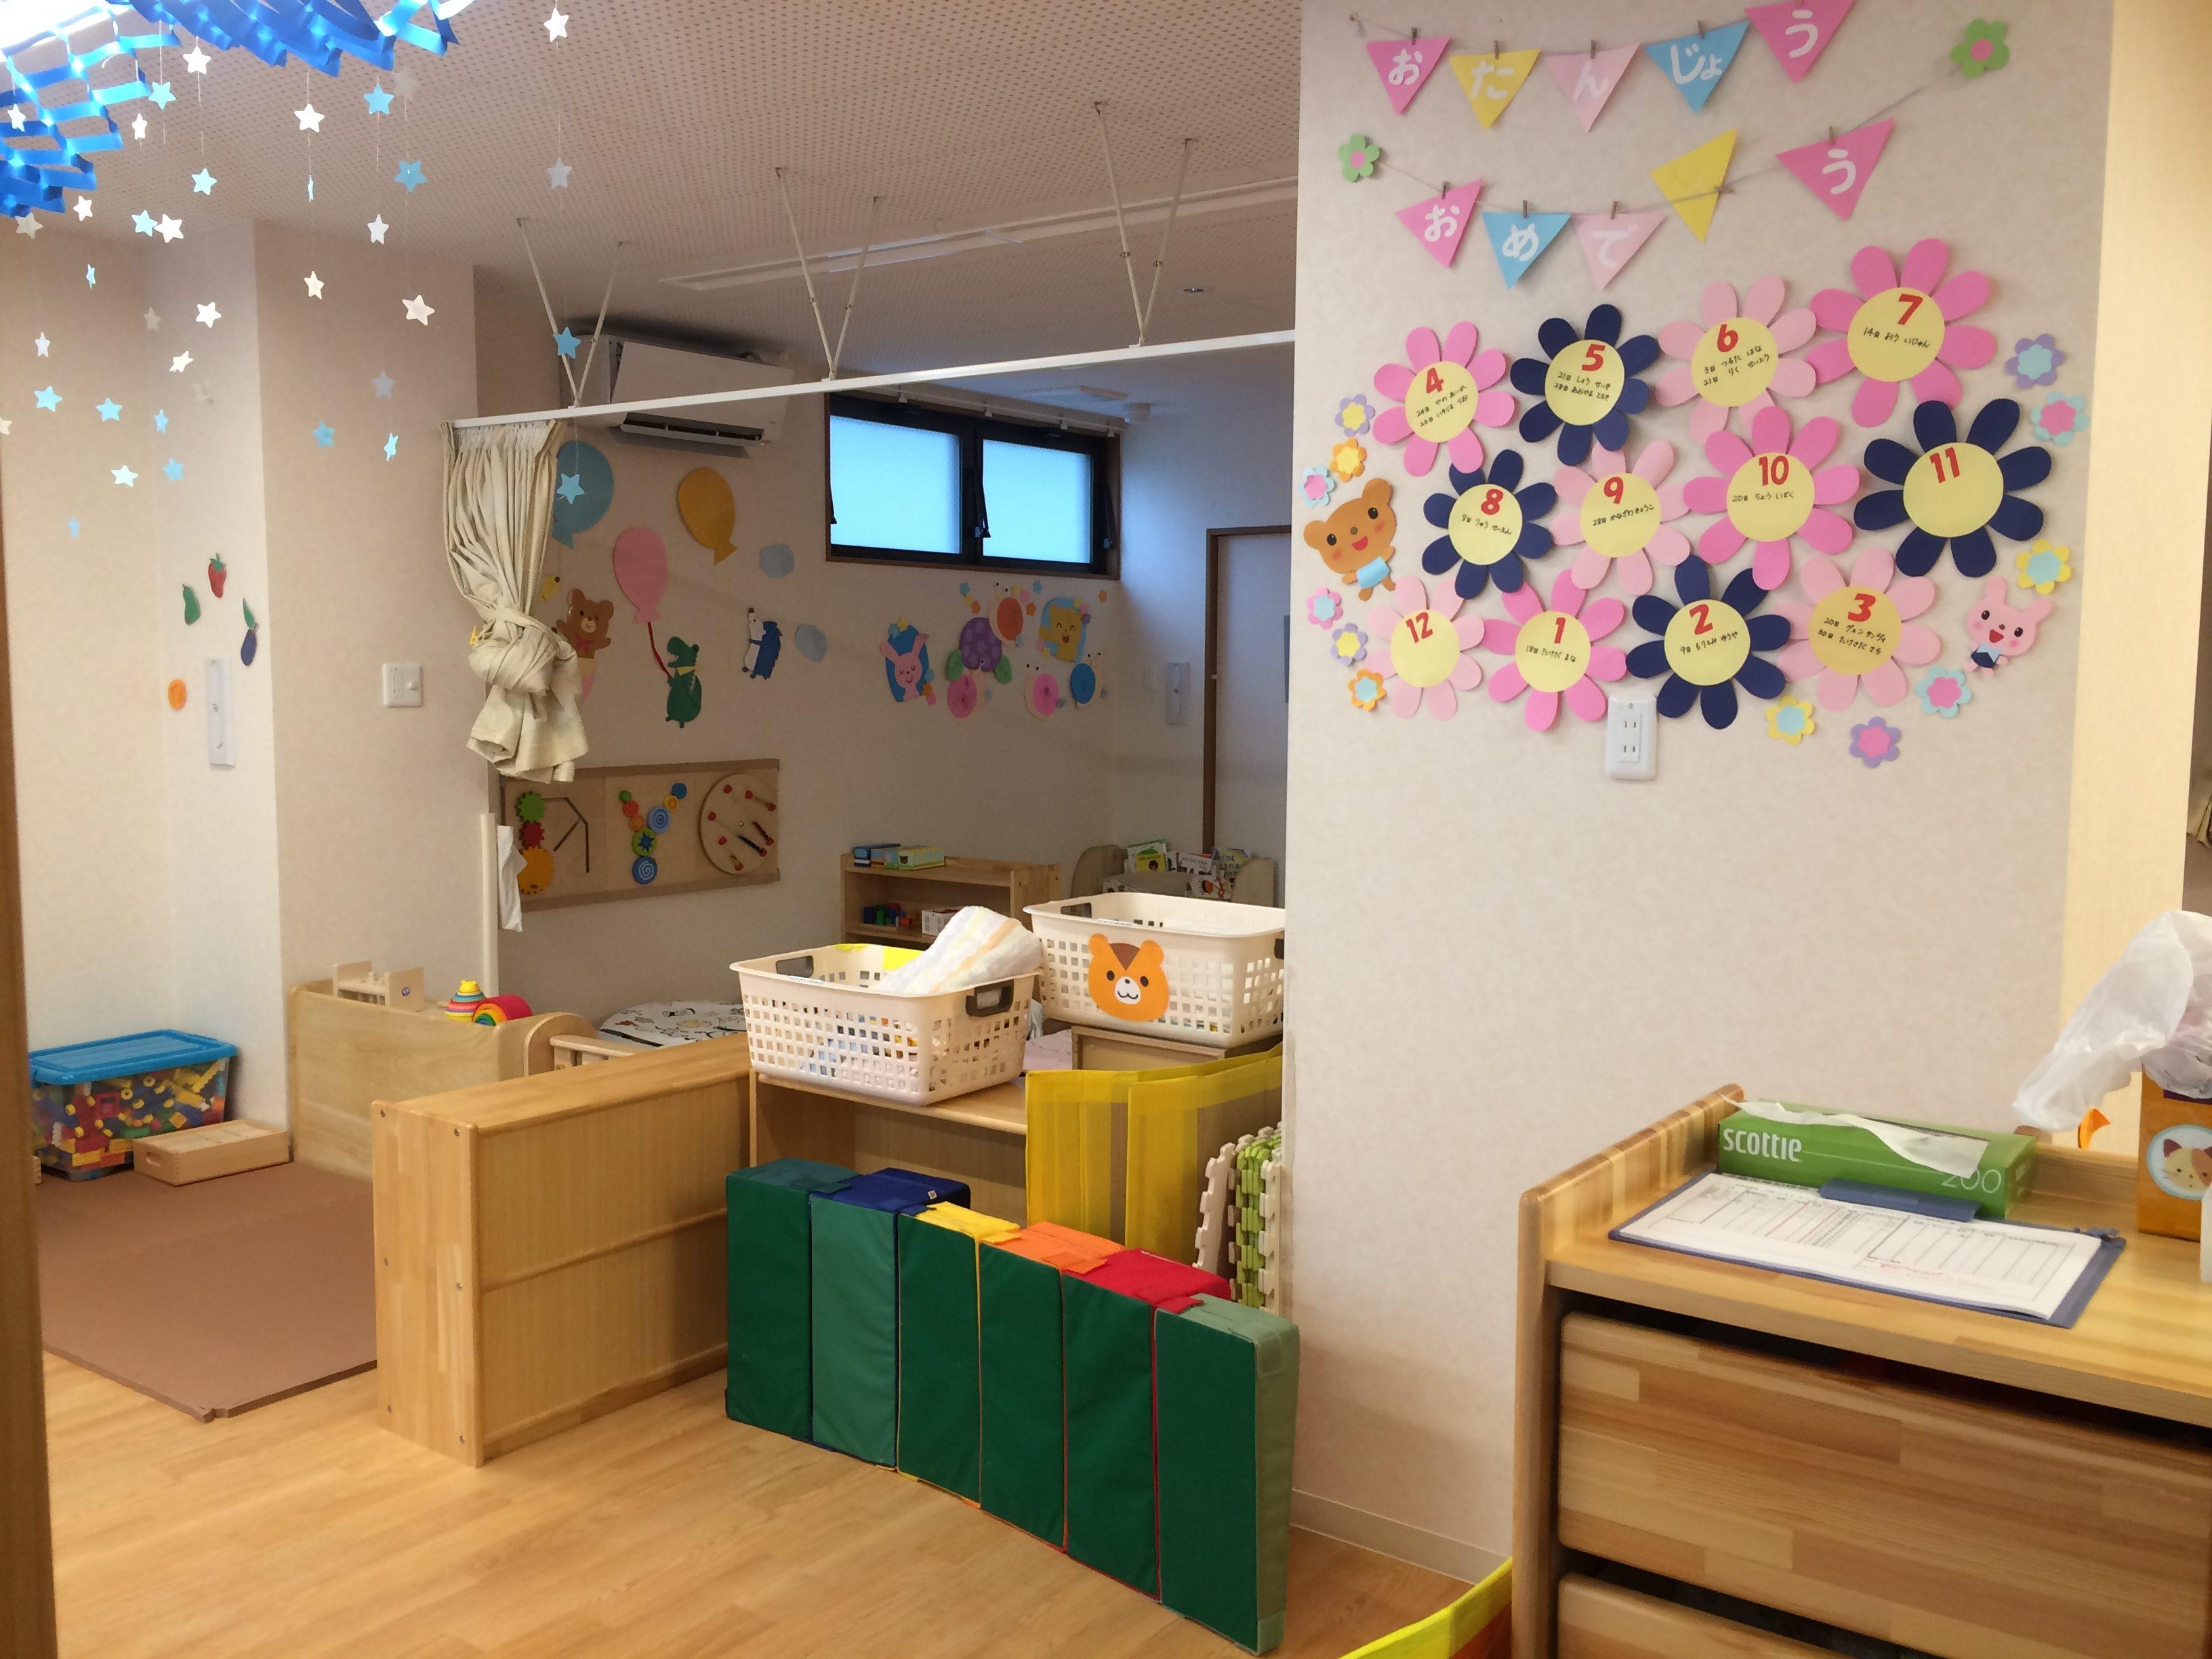 0才児担当の保育士|小規模保育園|神戸中央区『元町』から徒歩圏内